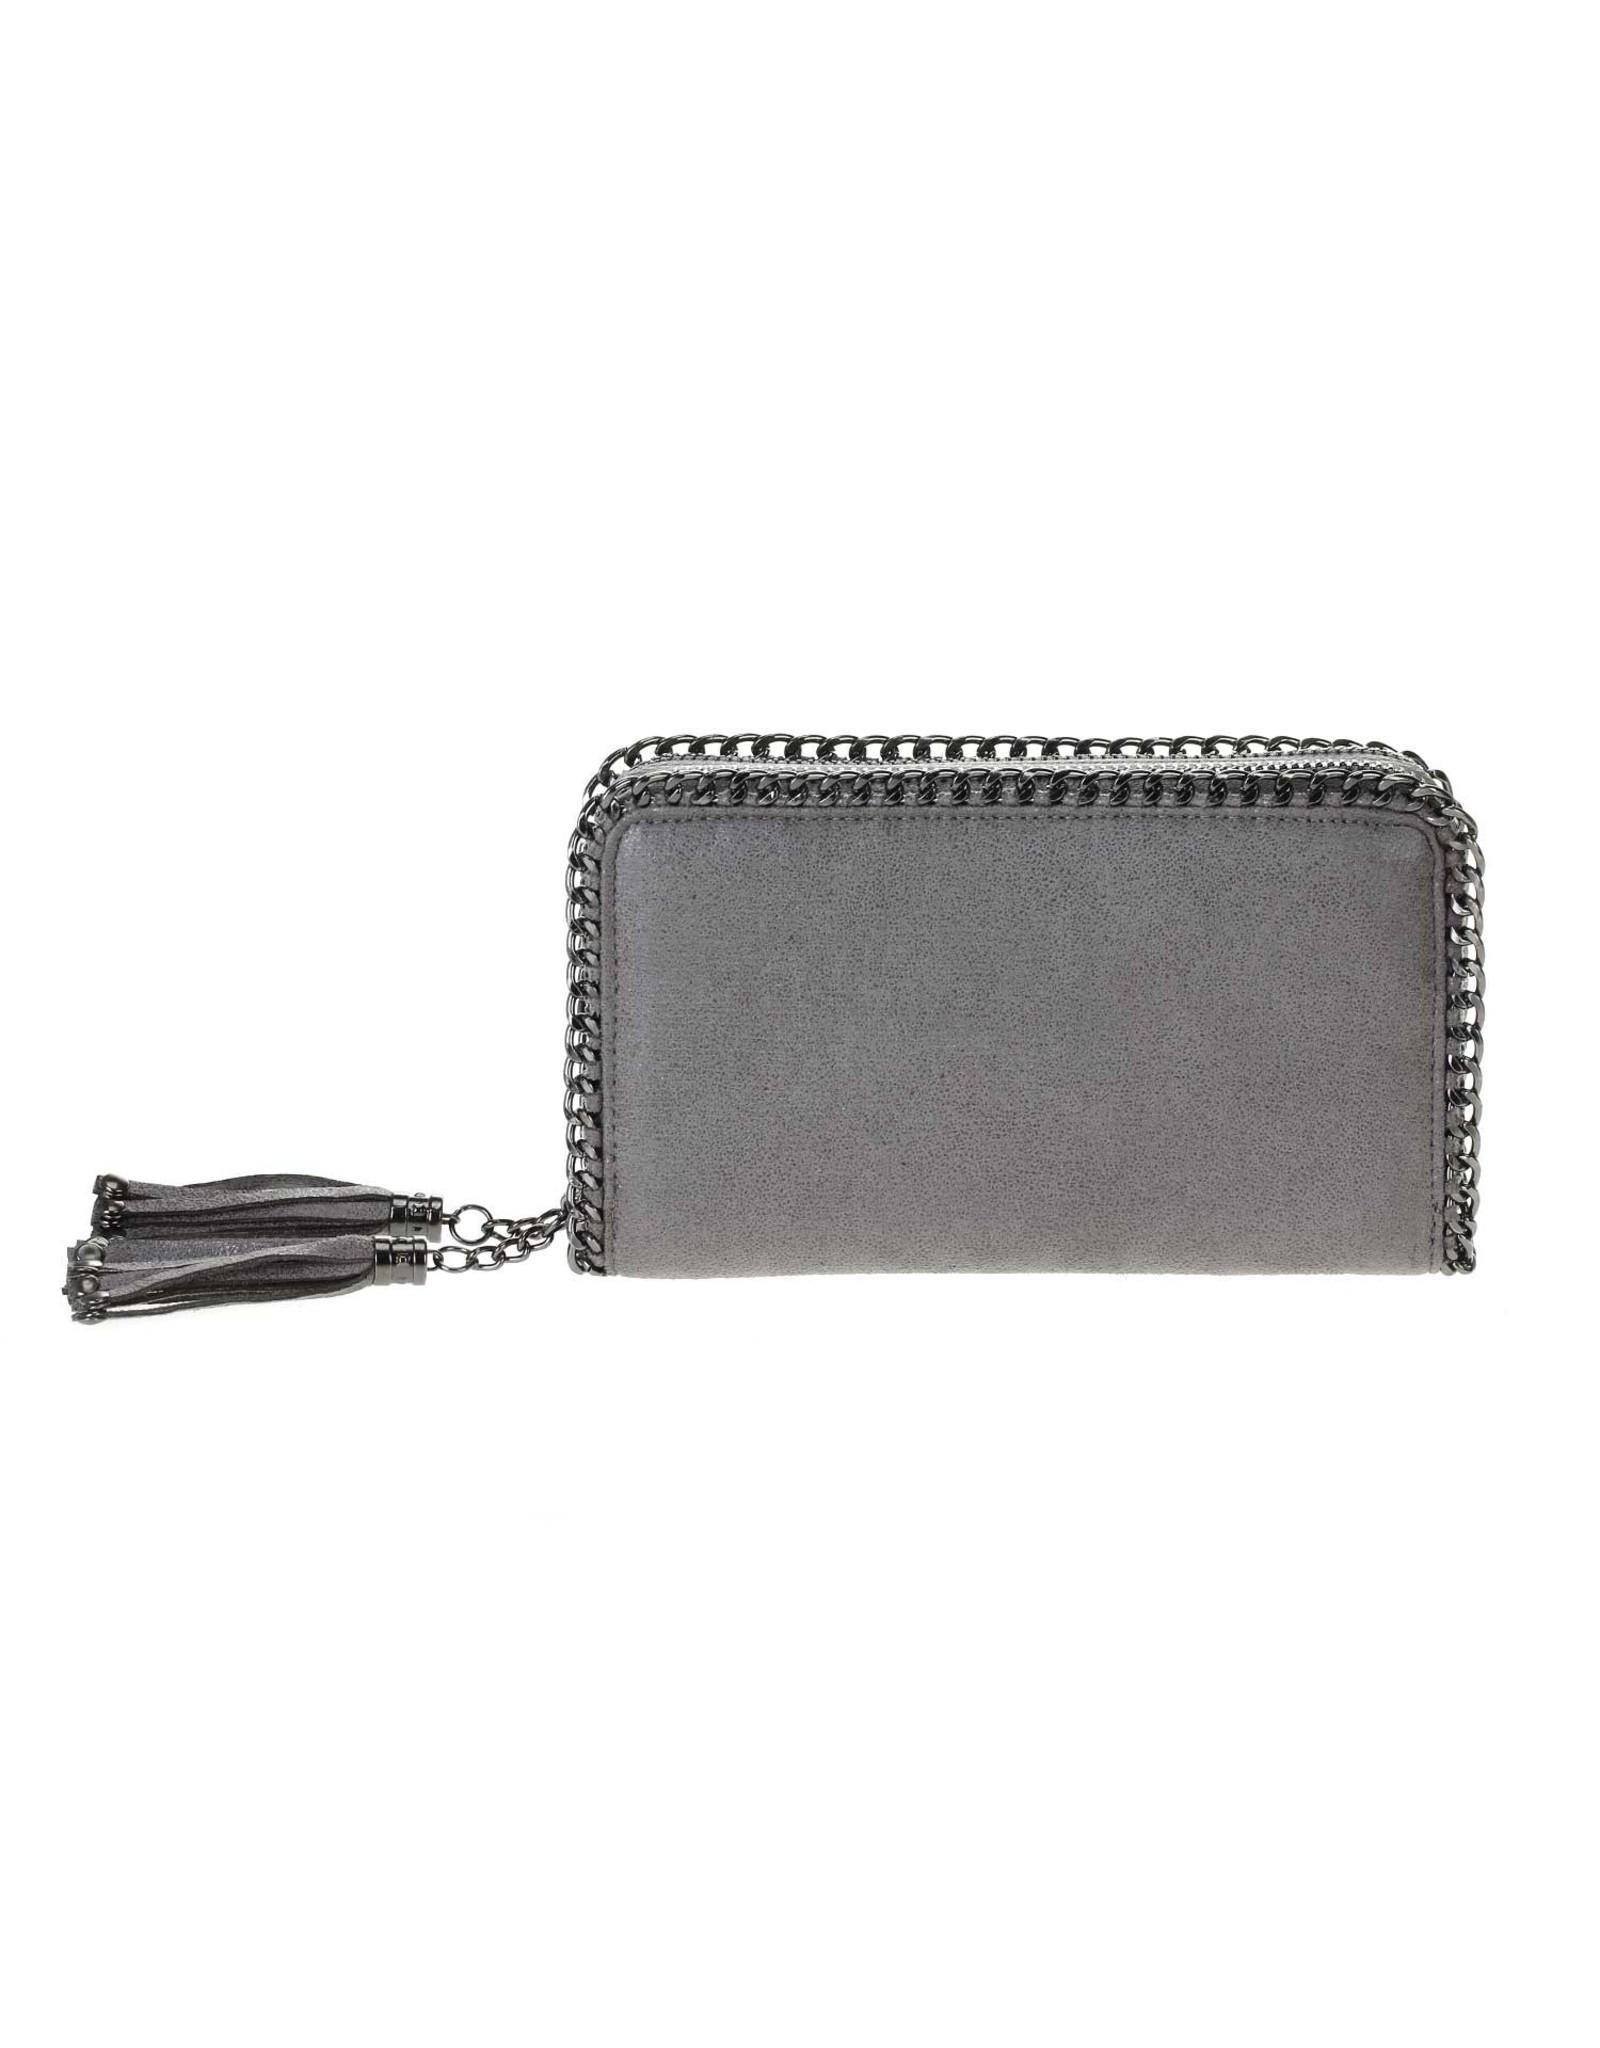 Grey Dbl Zipper Wallet/Crossbody